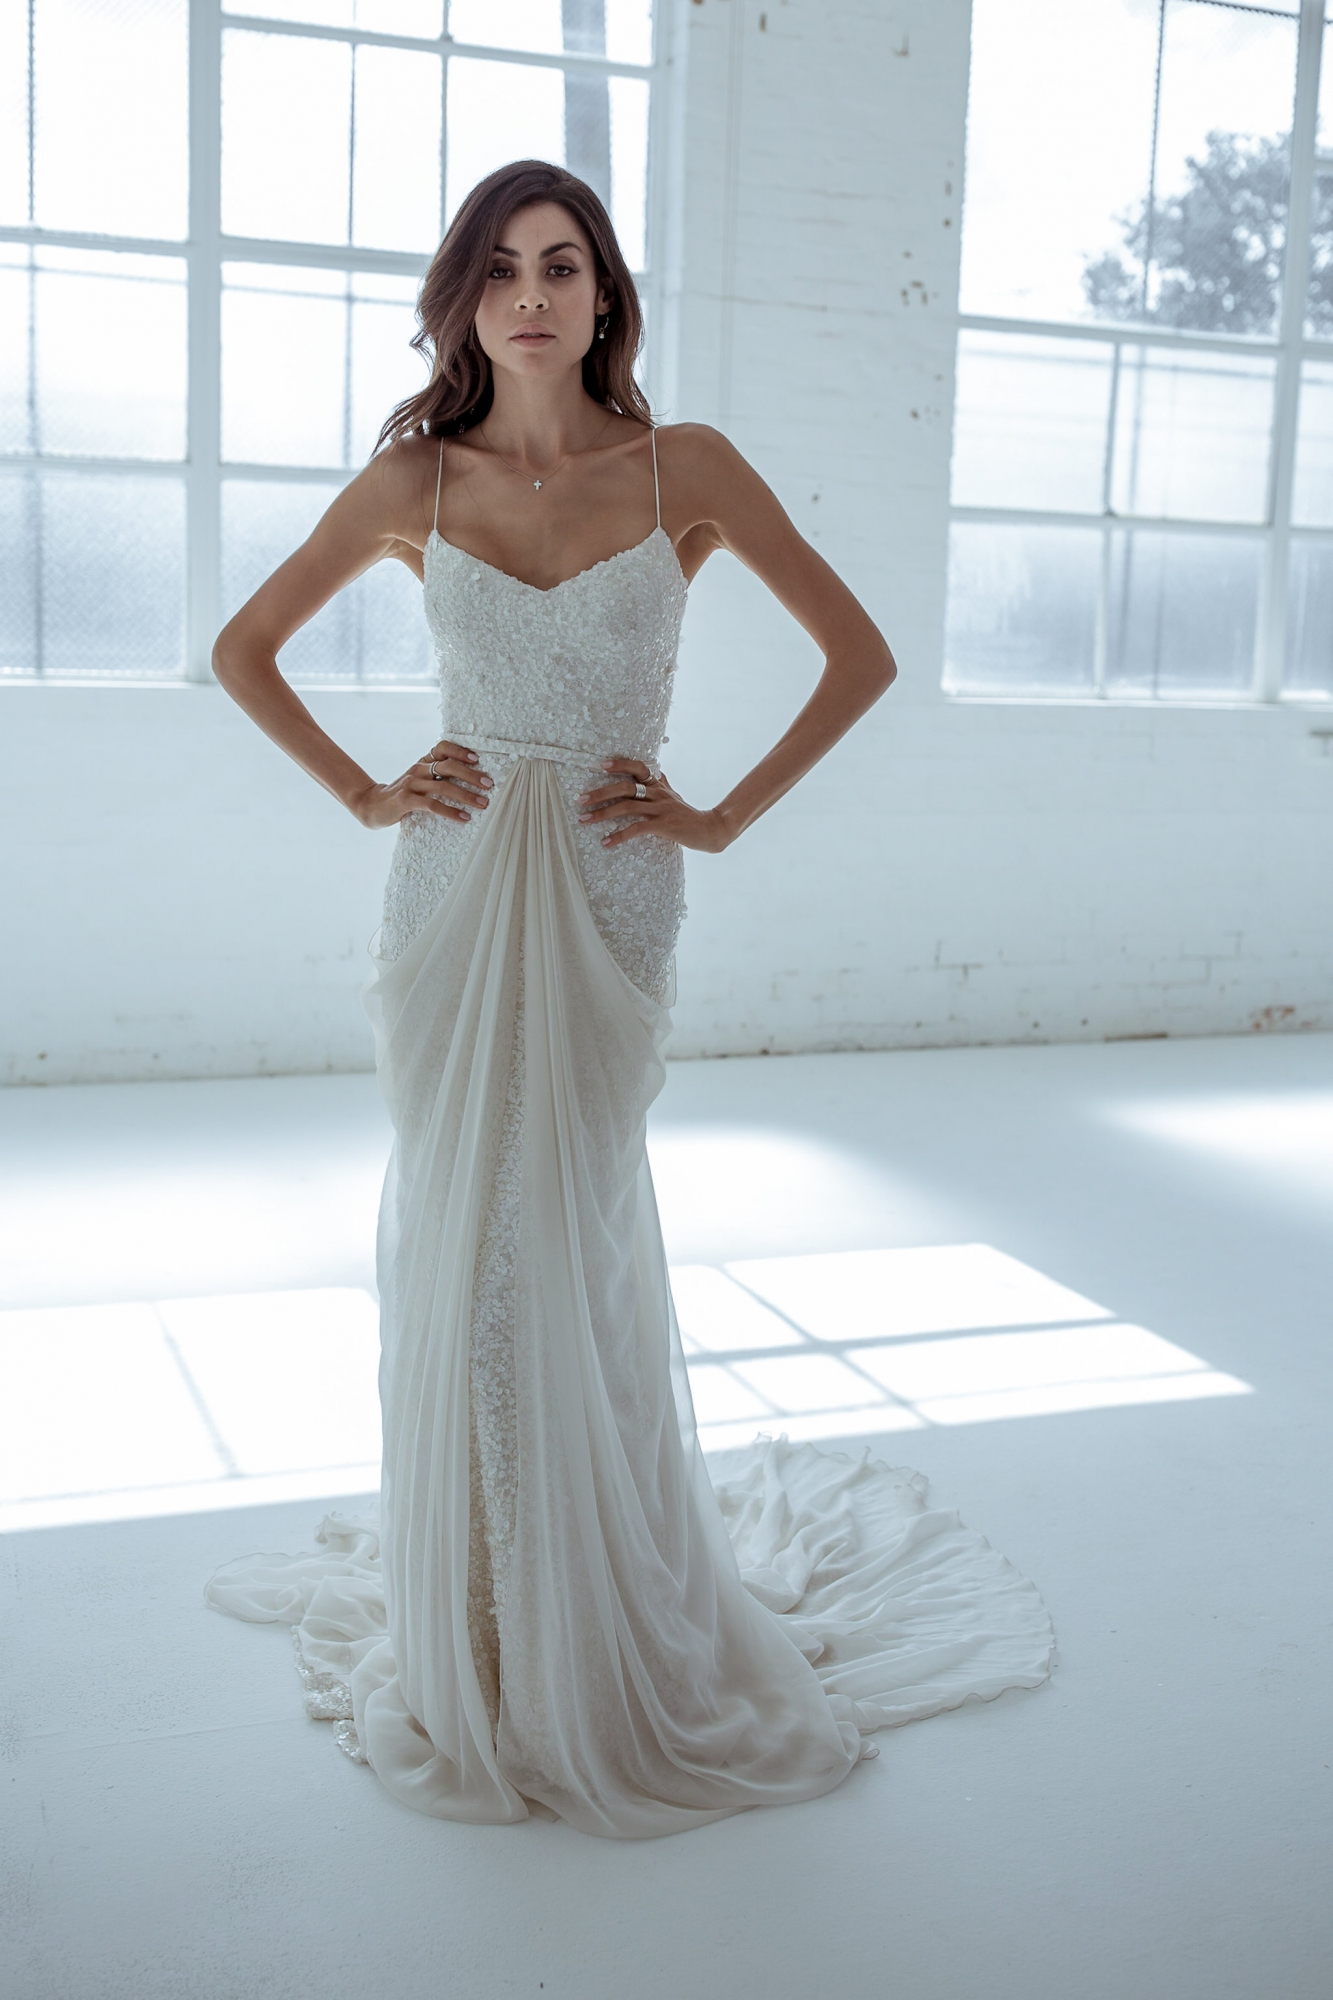 30 Seriously Glam Wedding Dresses for 2018 Brides | weddingsonline